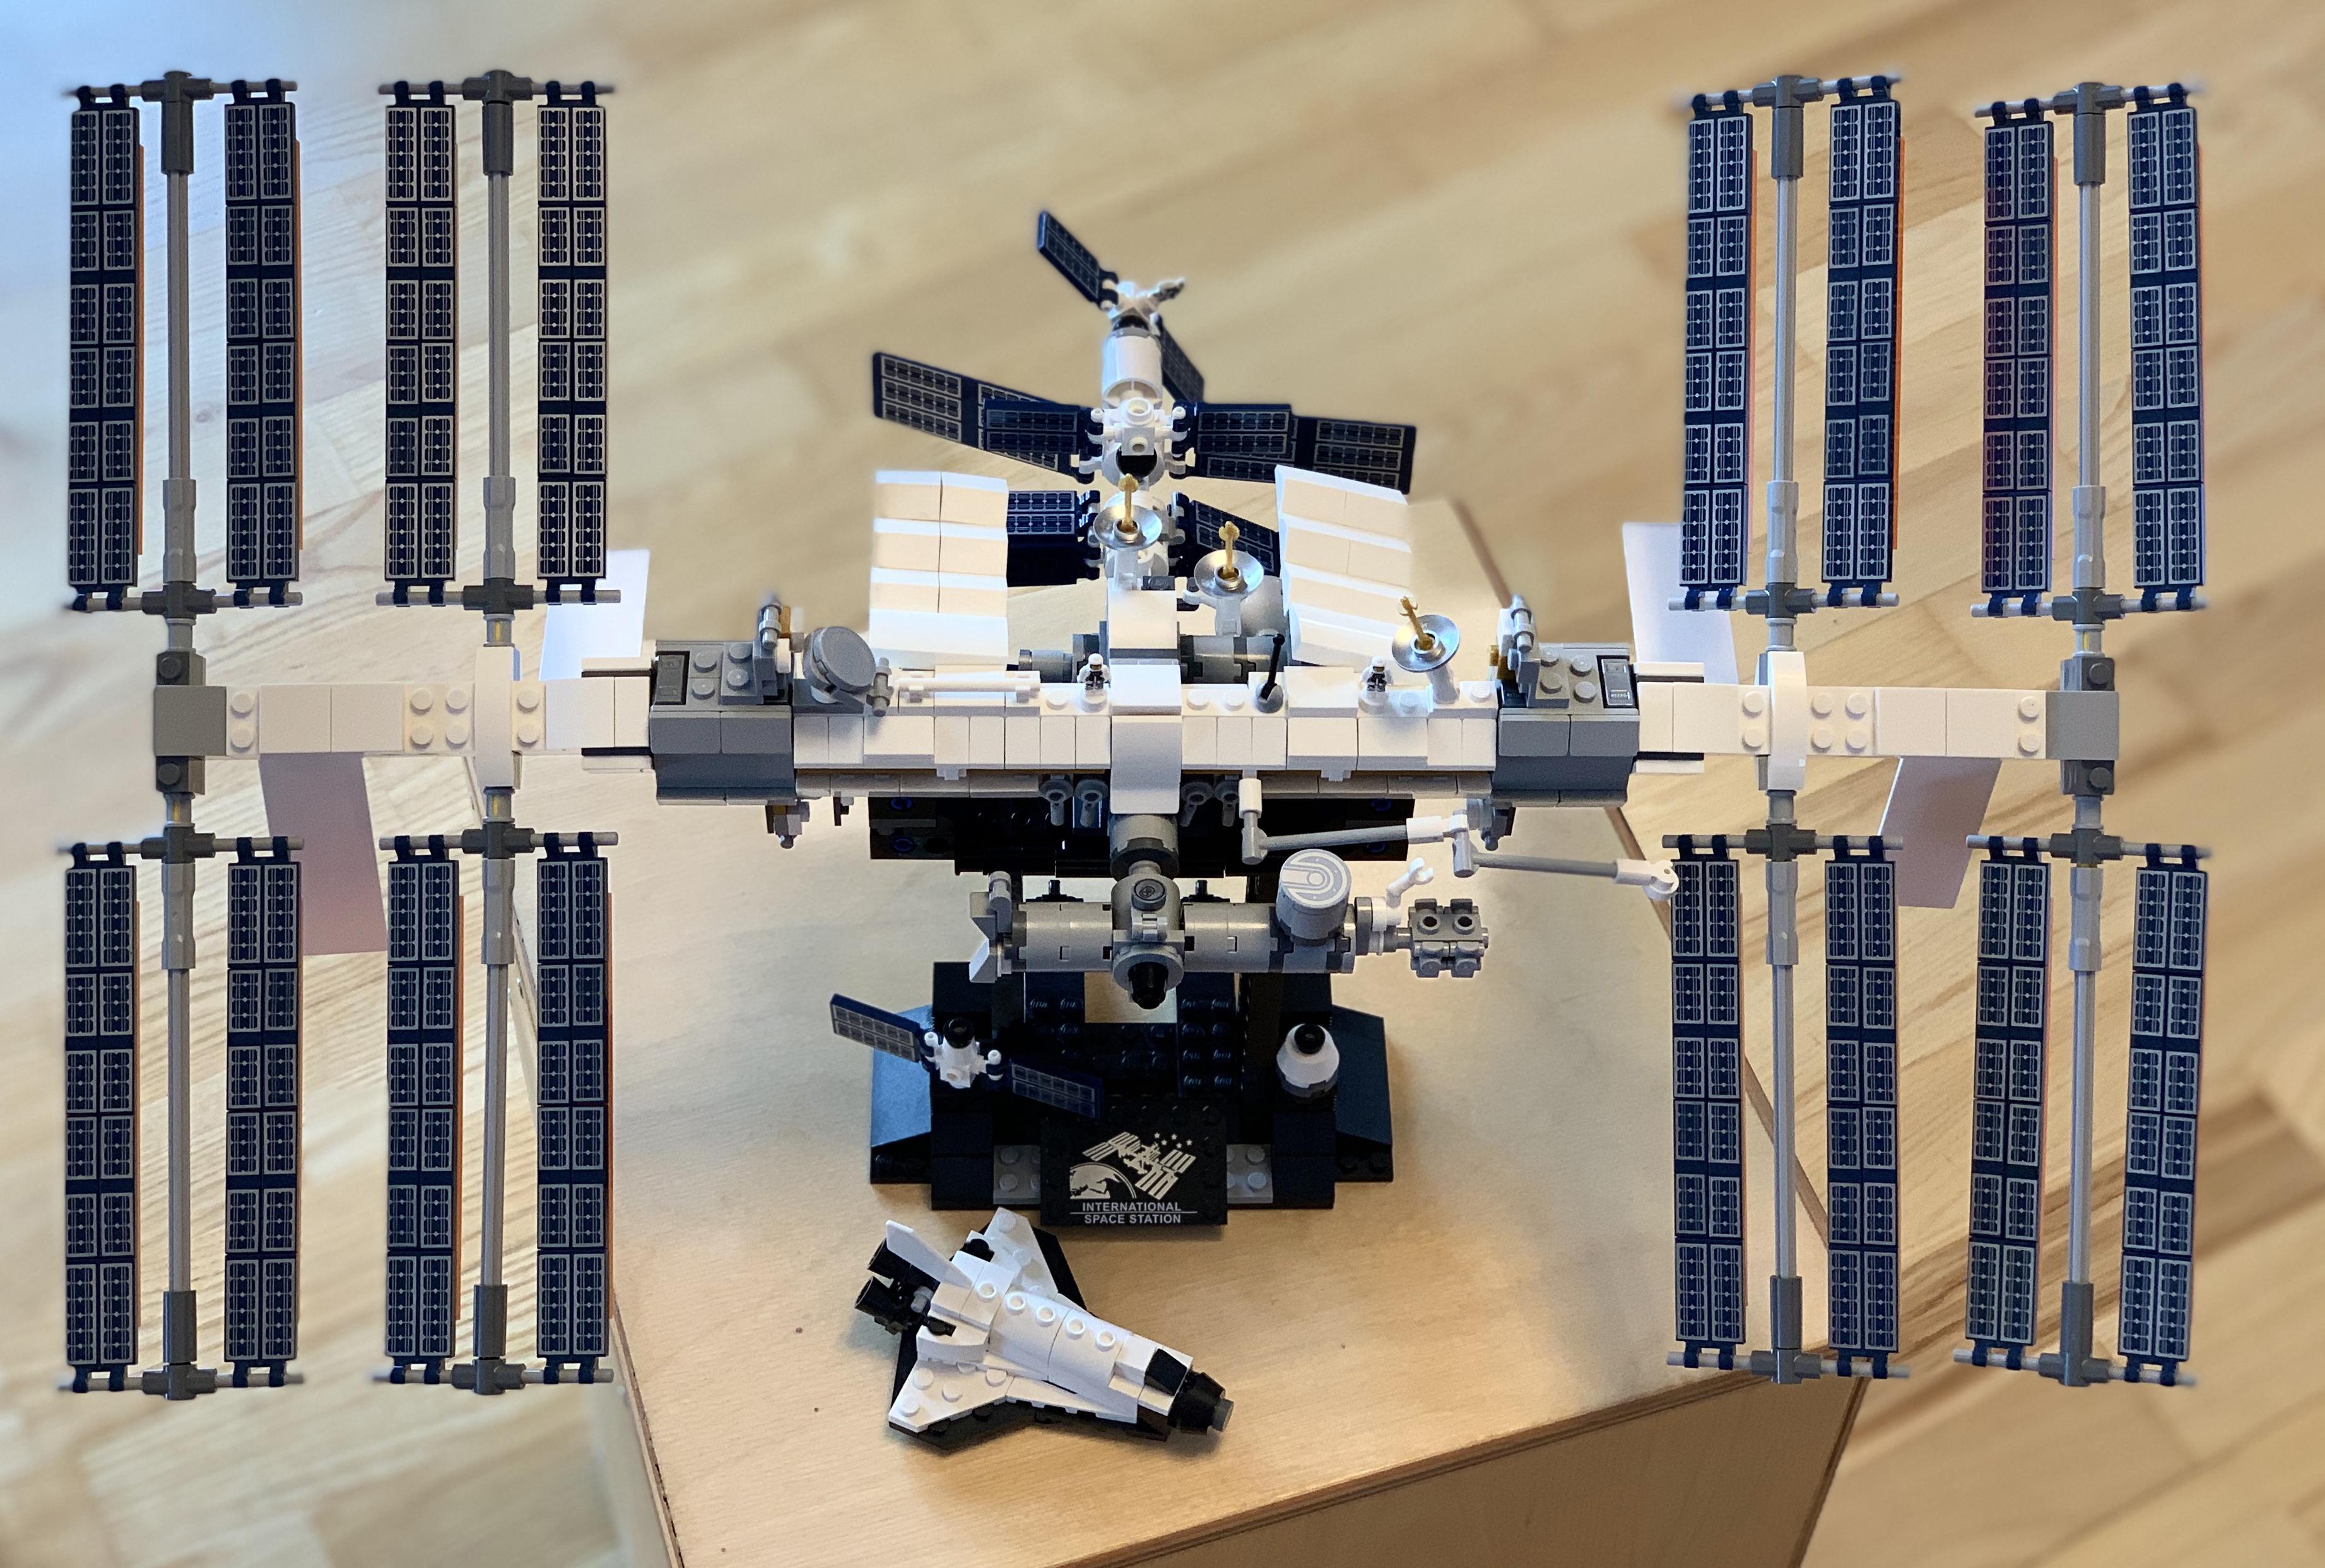 Lego ISS 130 x 88